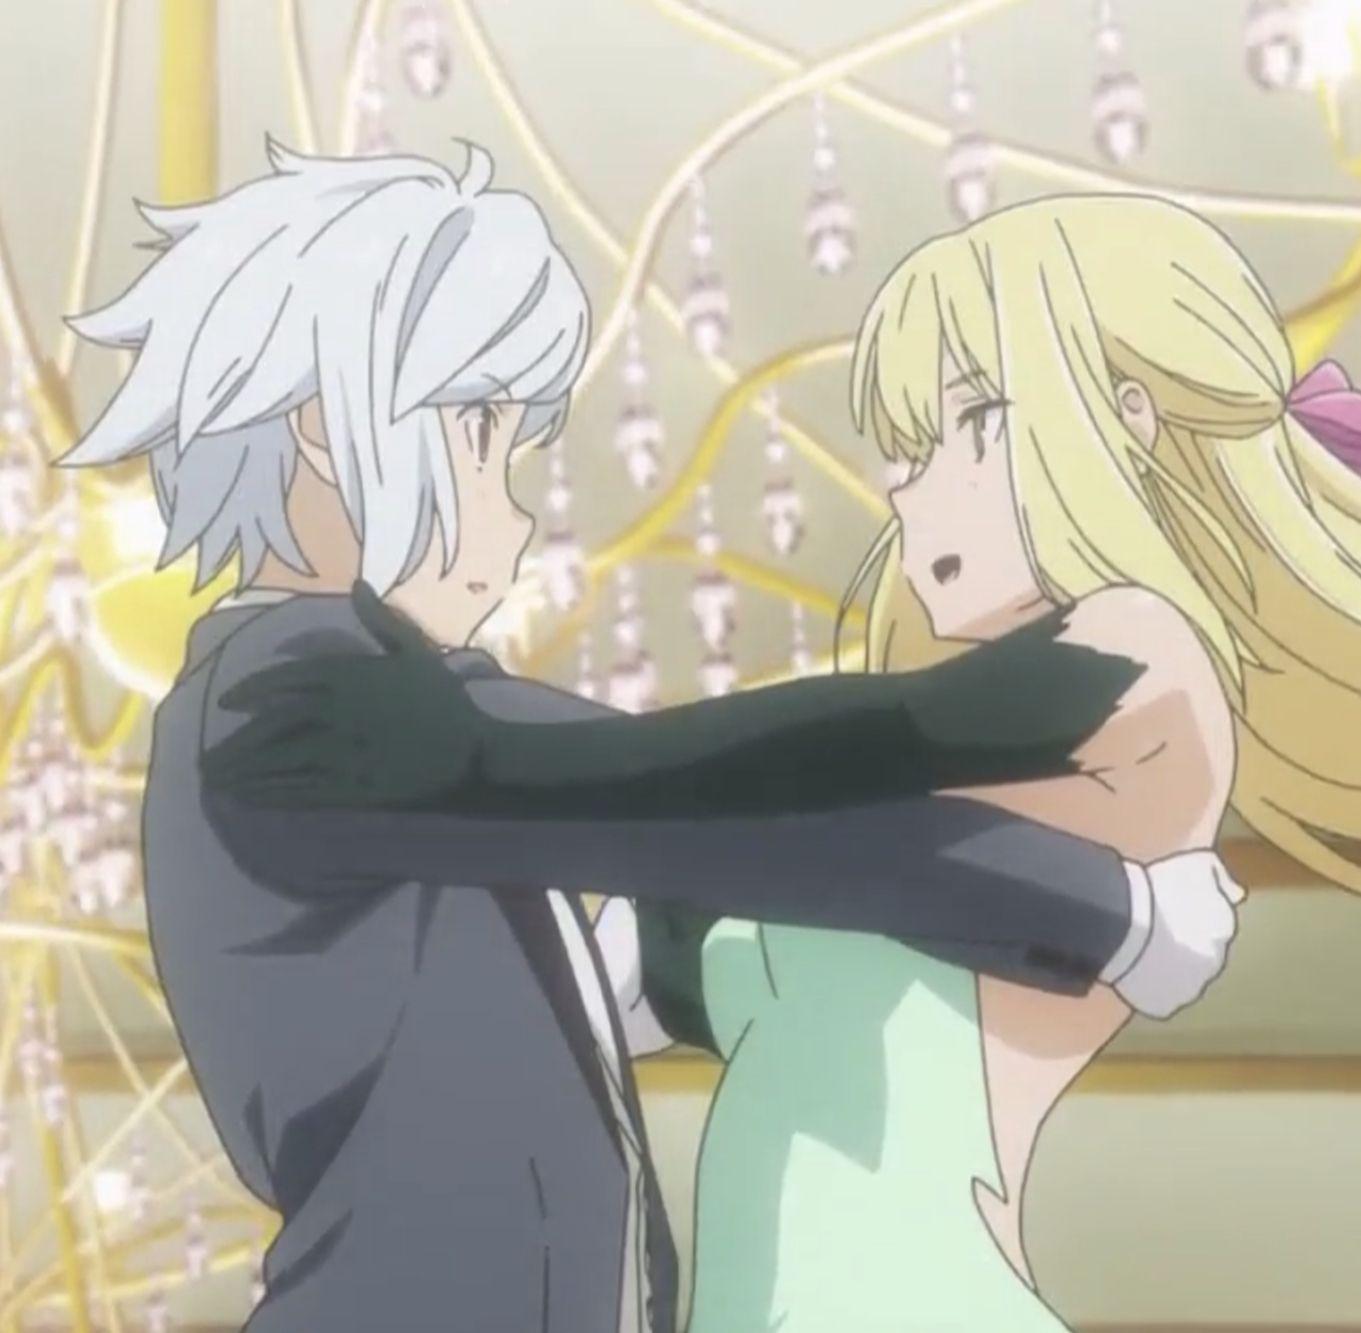 Danmachi Anime Animes Wallpapers Menina Anime